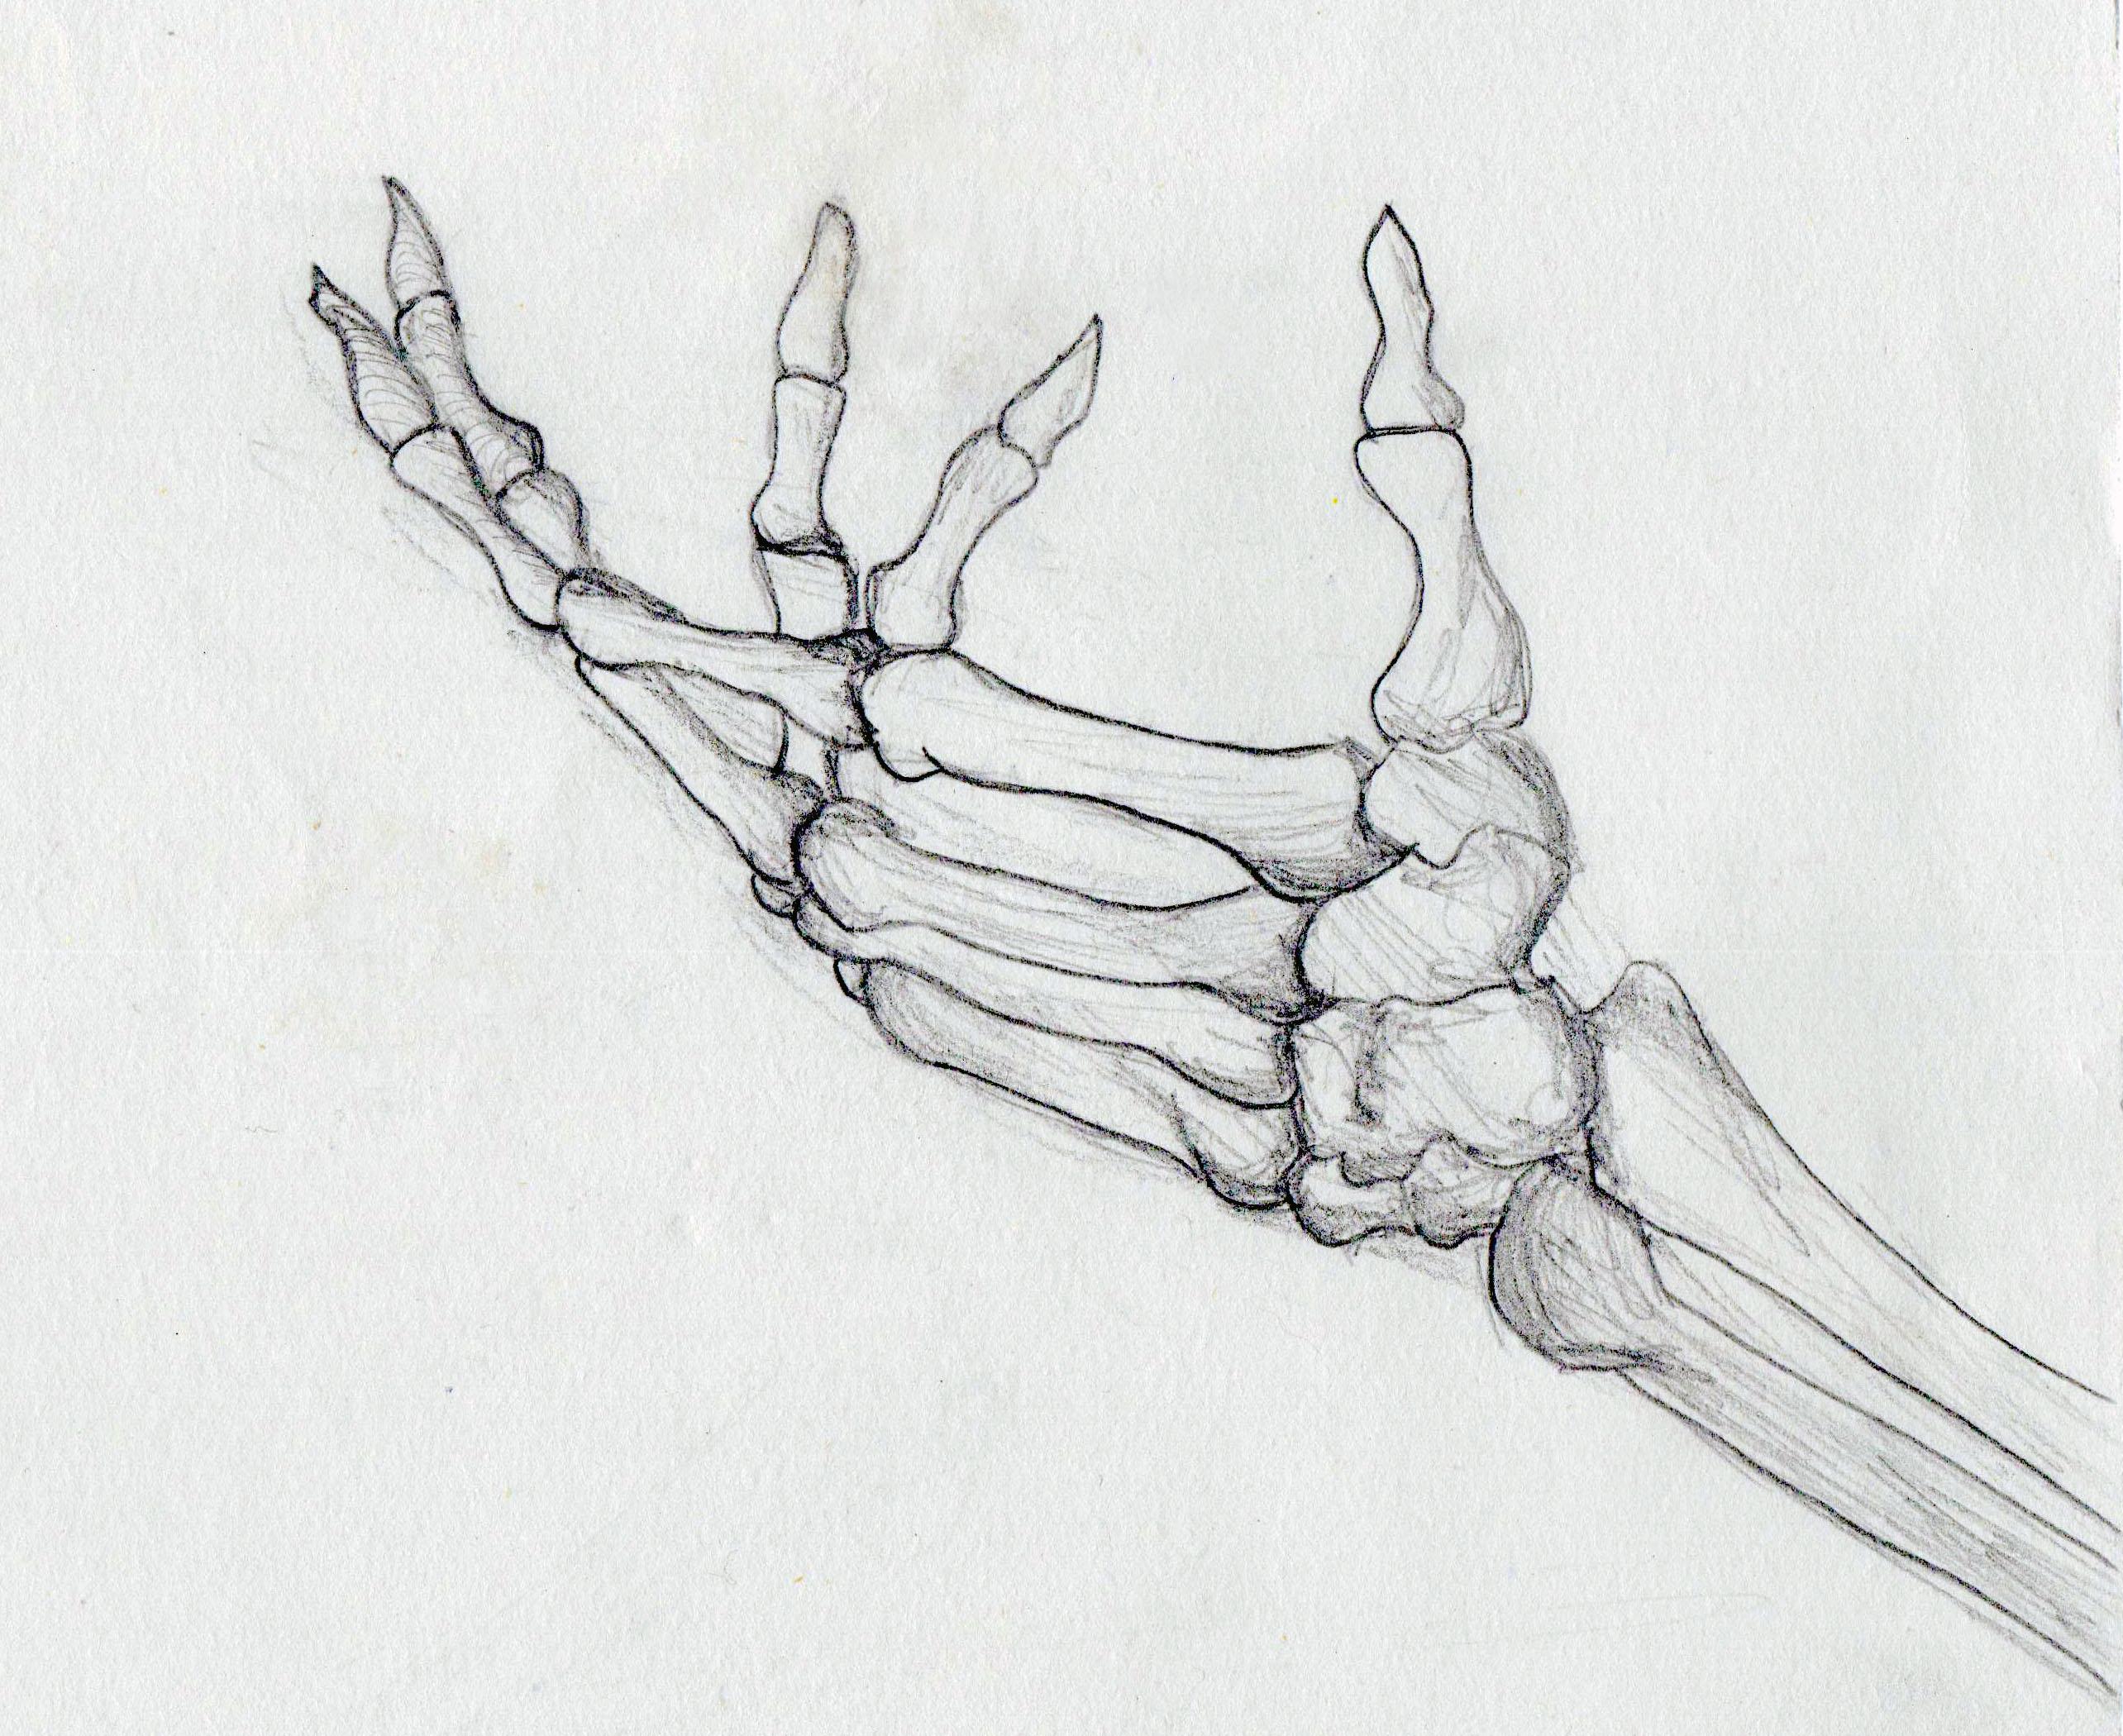 Drawn sleleton hand drawn Search Search hand Skulls side